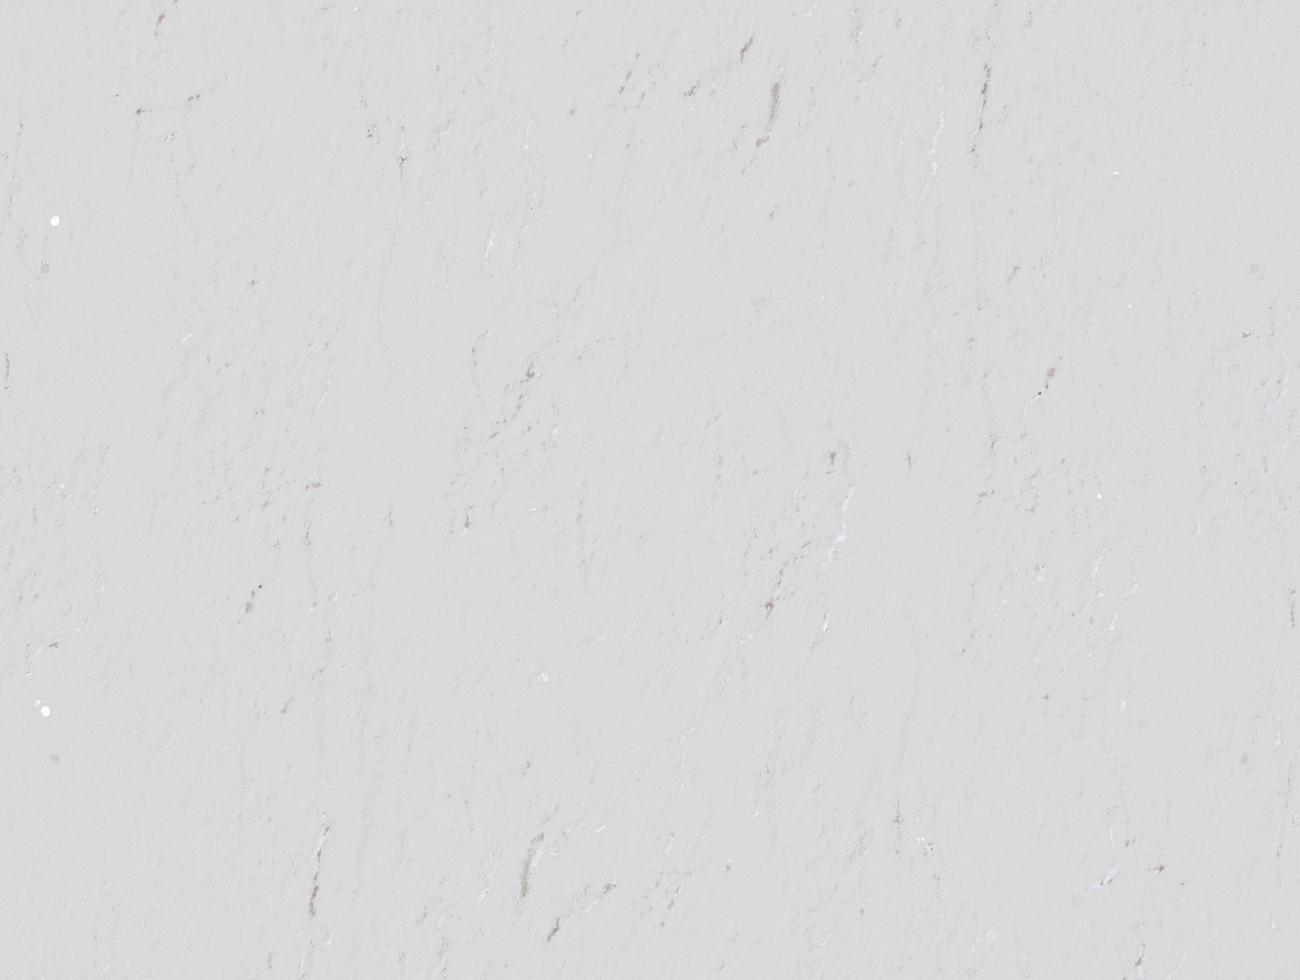 texture de mur propre en béton photo